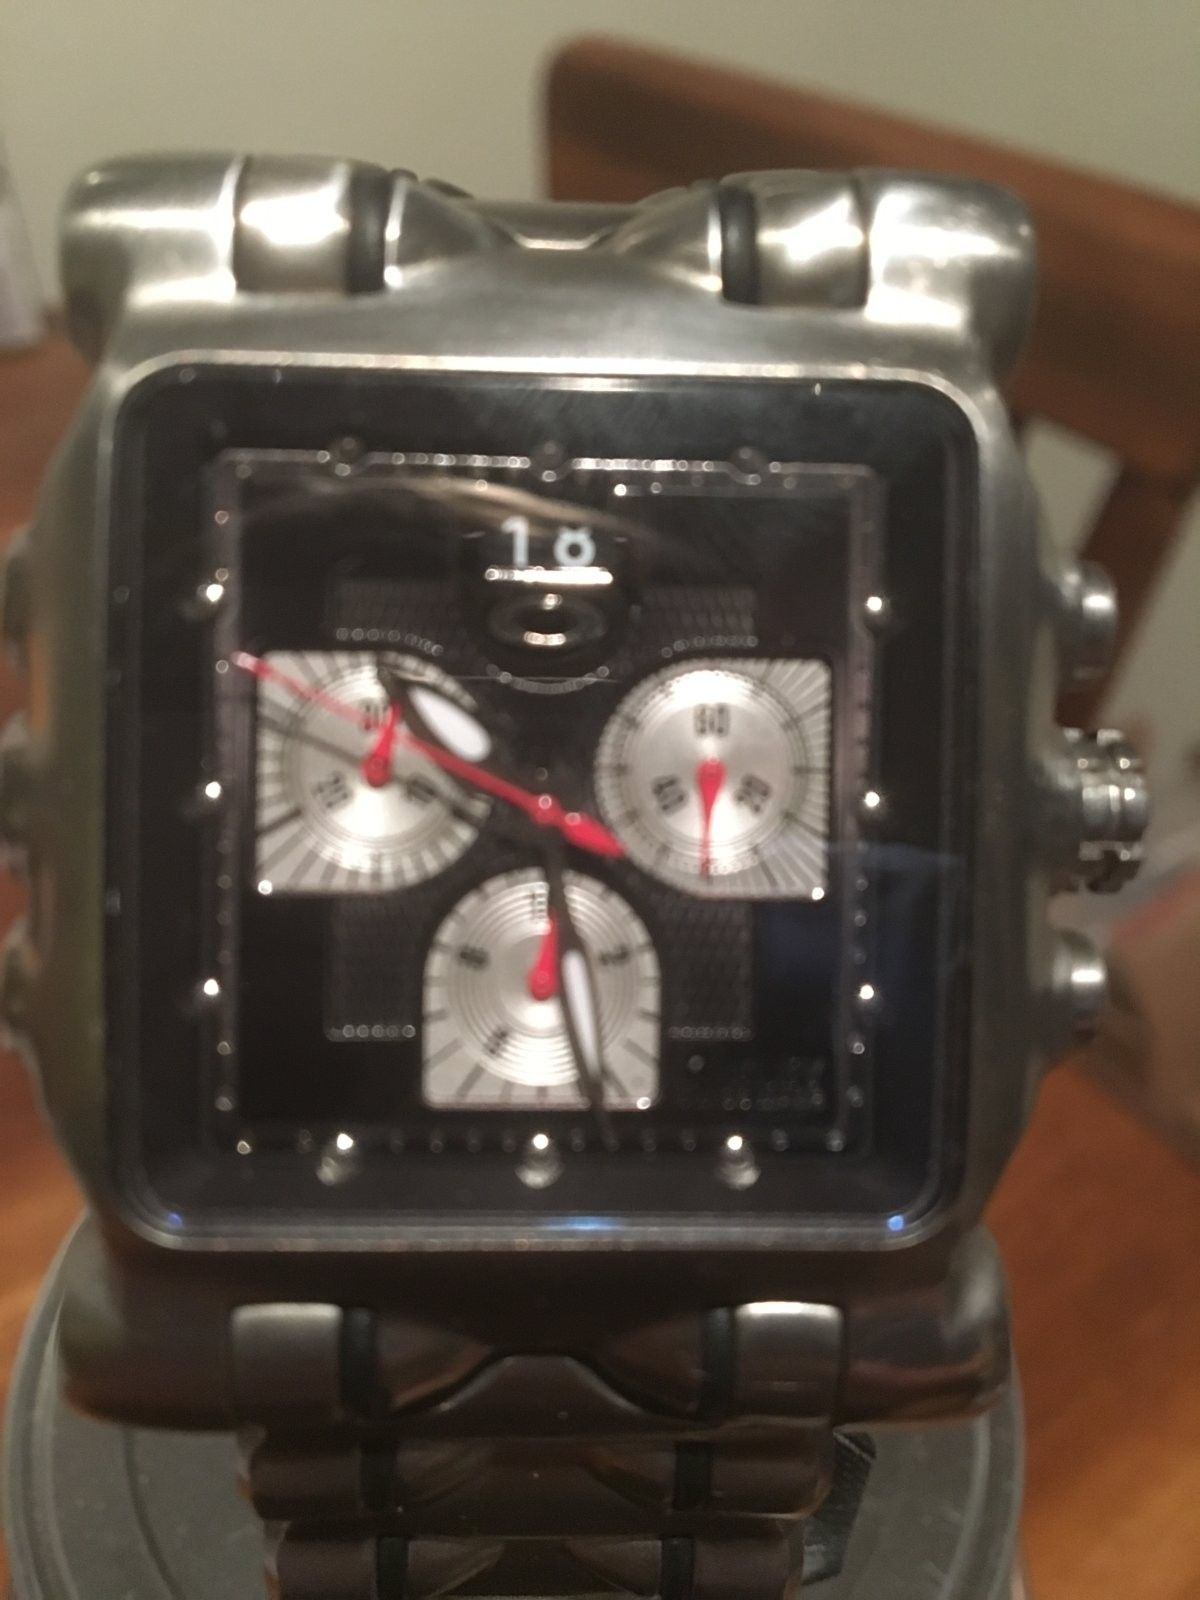 3 watches: crankcase, killswitch and MM - image.jpeg